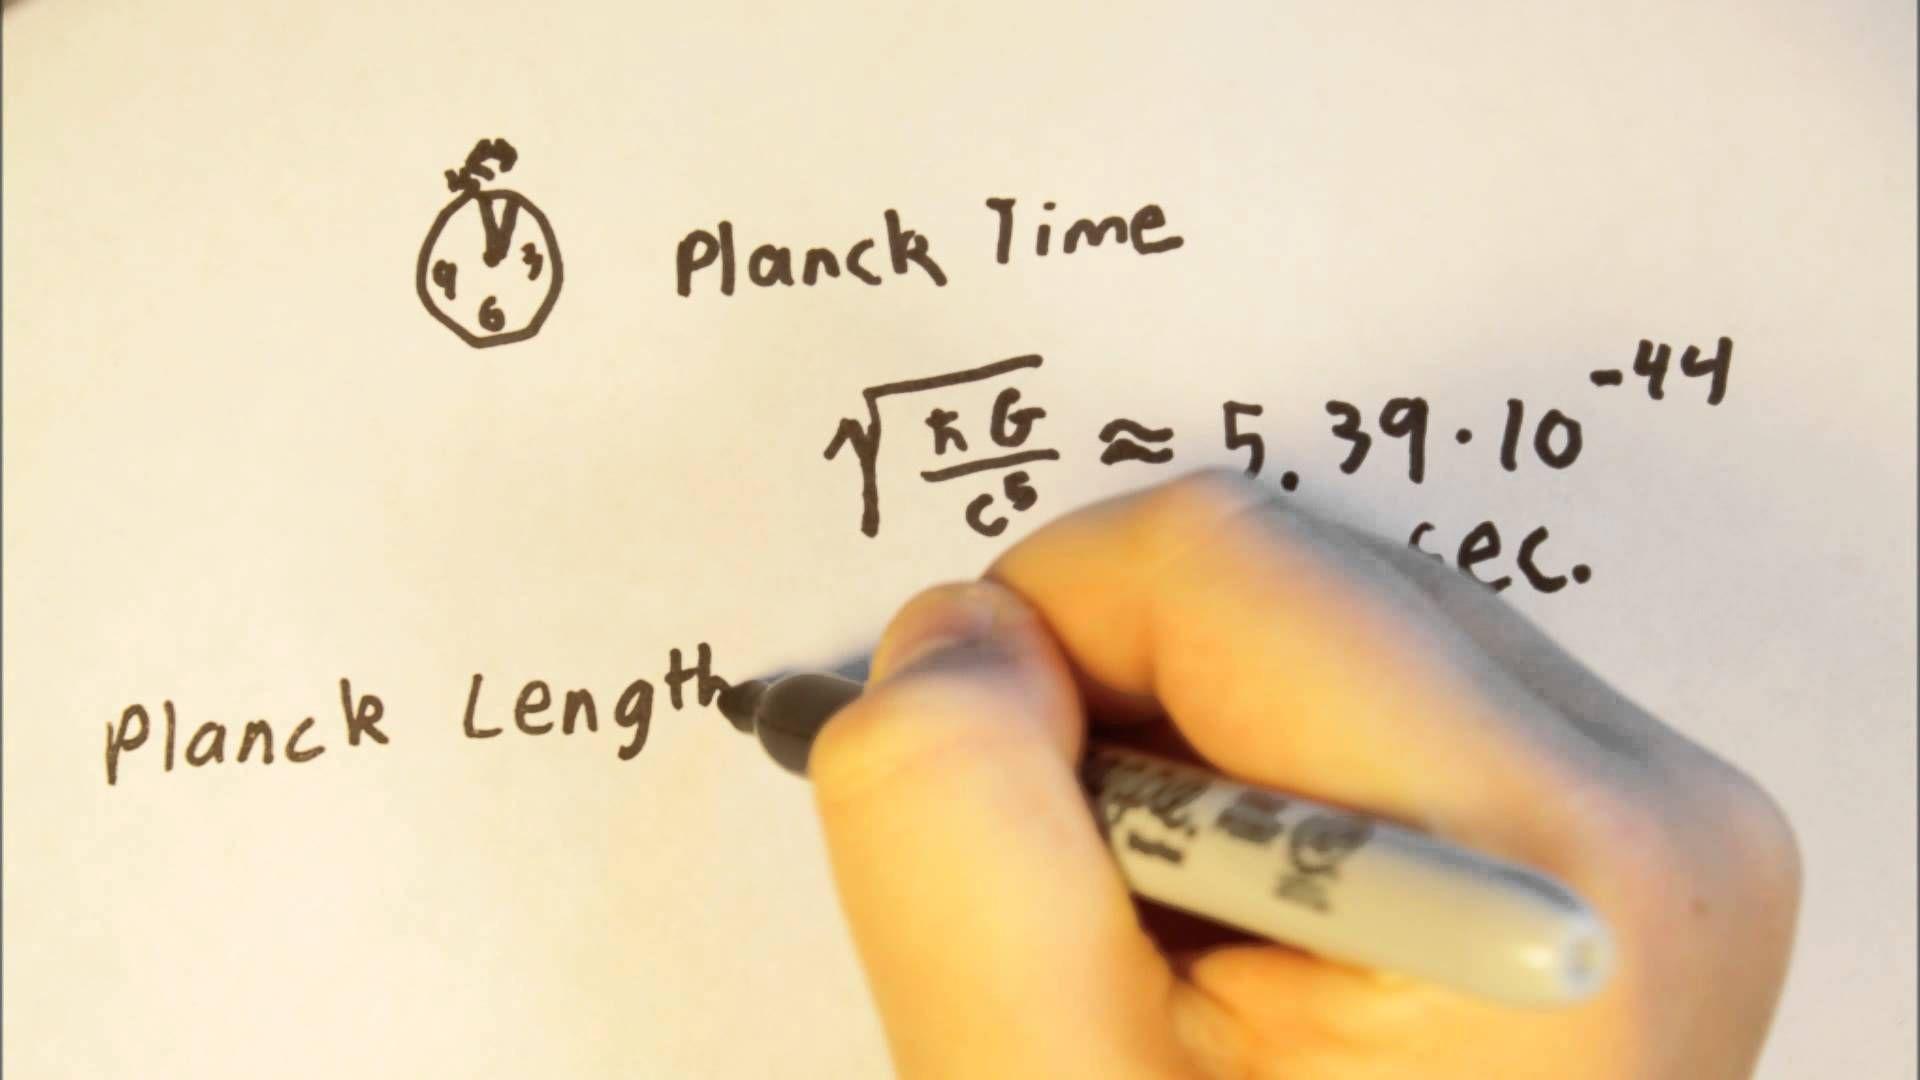 Planck's Constant | Planck constant, Astronomy science, Planck length